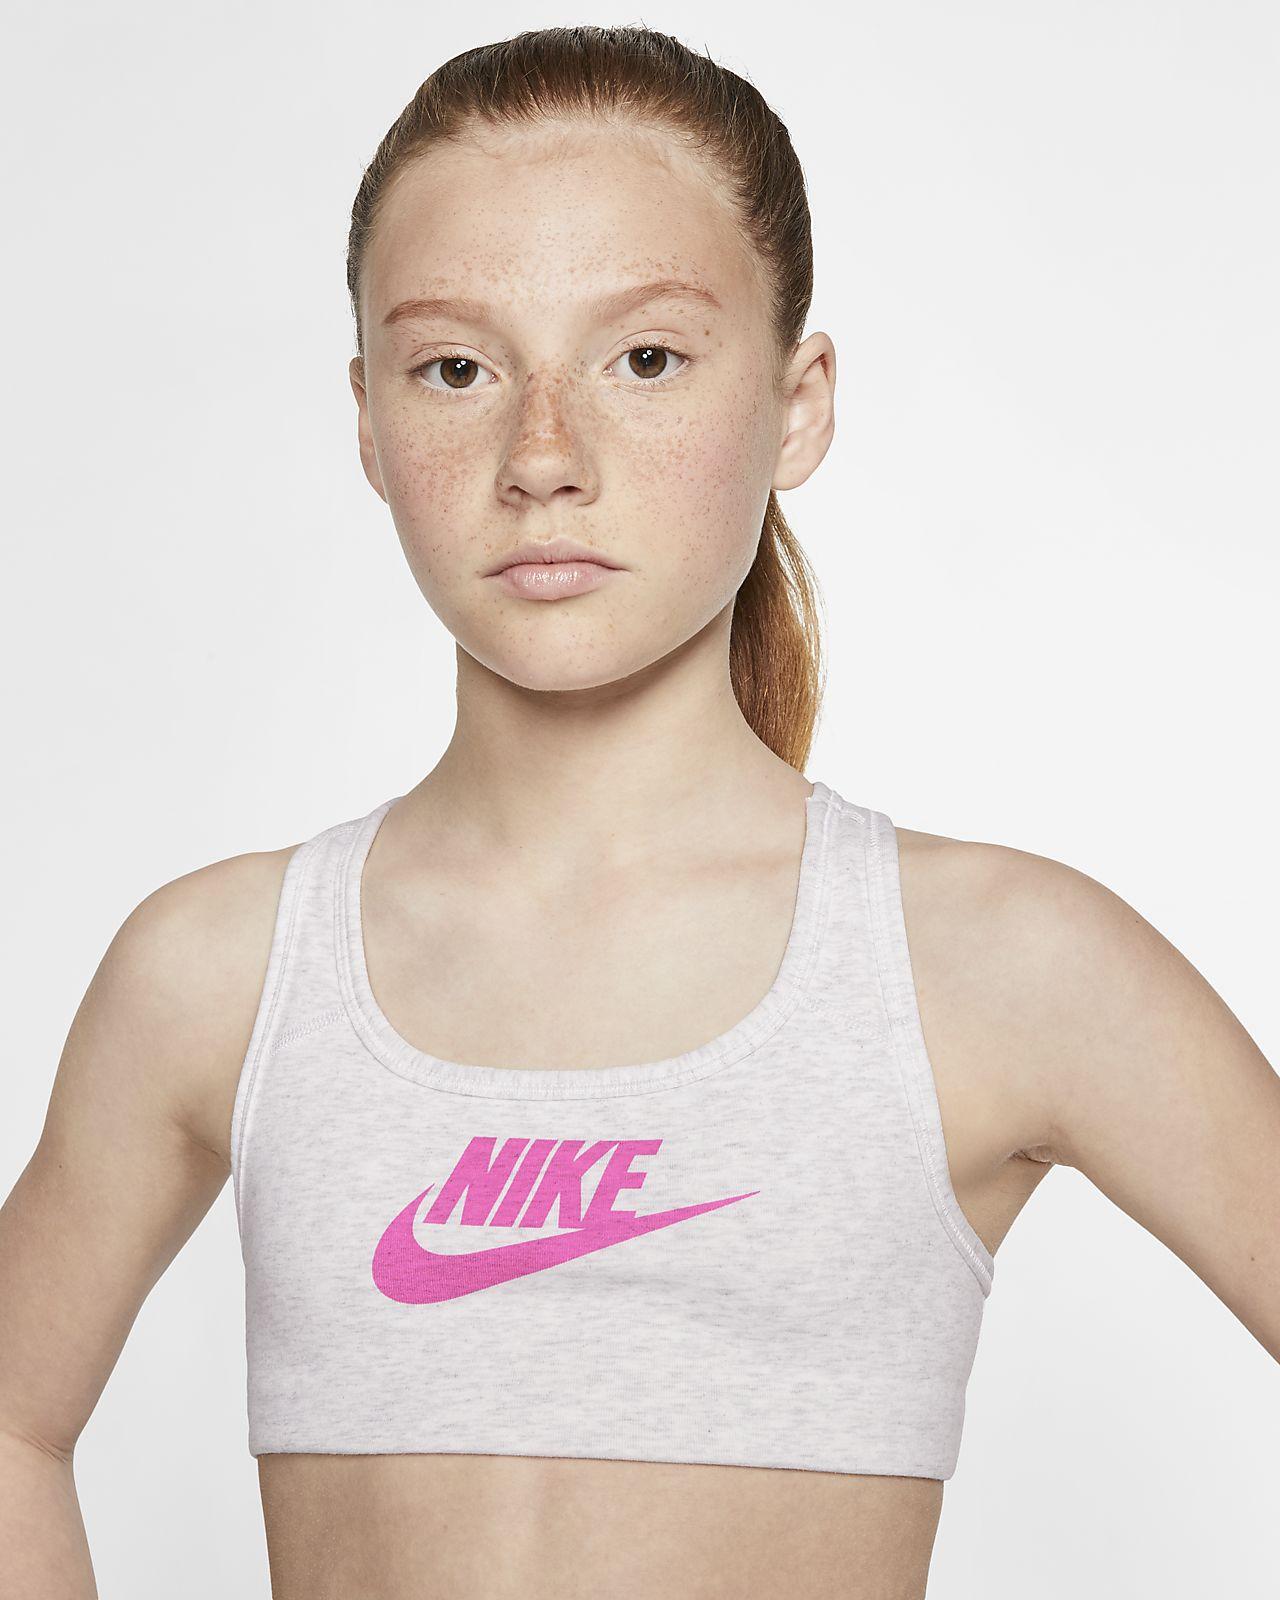 Nike Sportswear hverdags-BH til jente